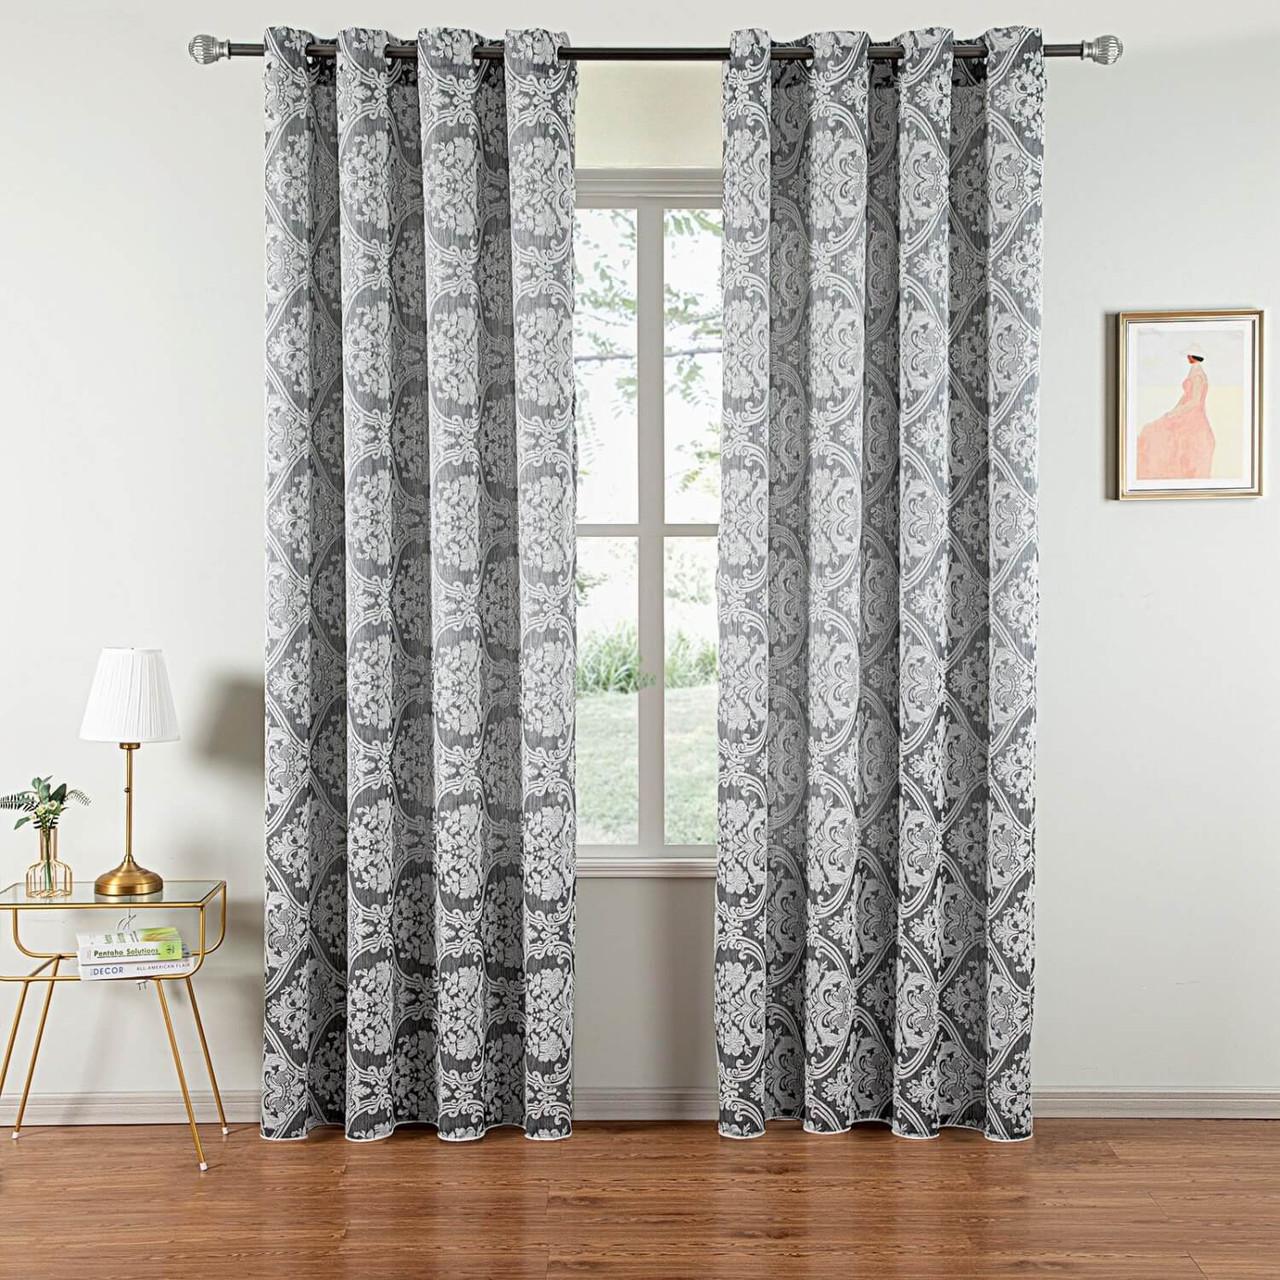 Curtain Panel Grommet-Top Window Treatments DMC502